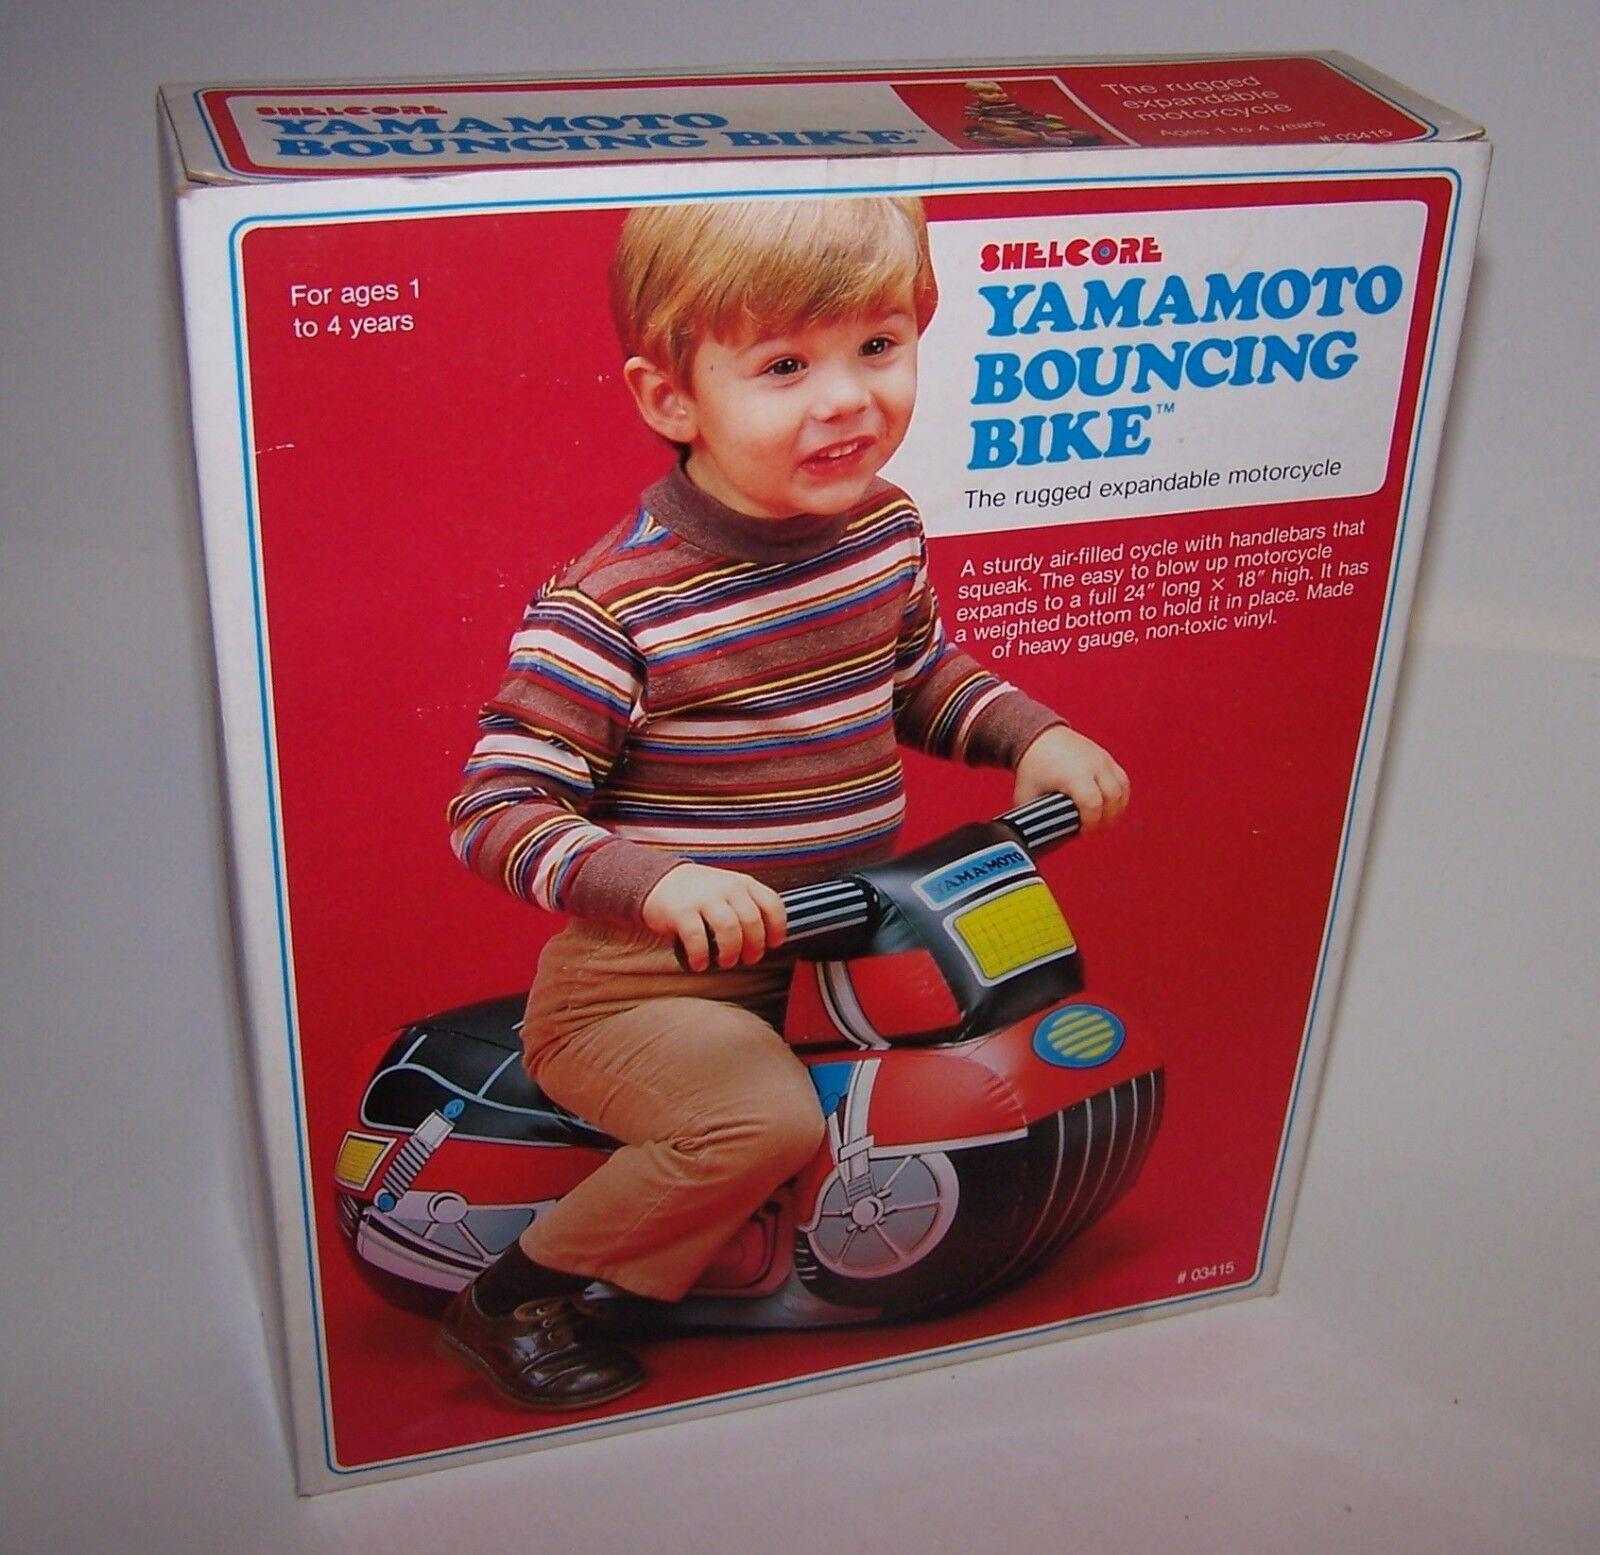 Shelcore Juguete ampliable Yamamoto rebotando Bicicleta Inflable explotar Nuevo en Caja 1984